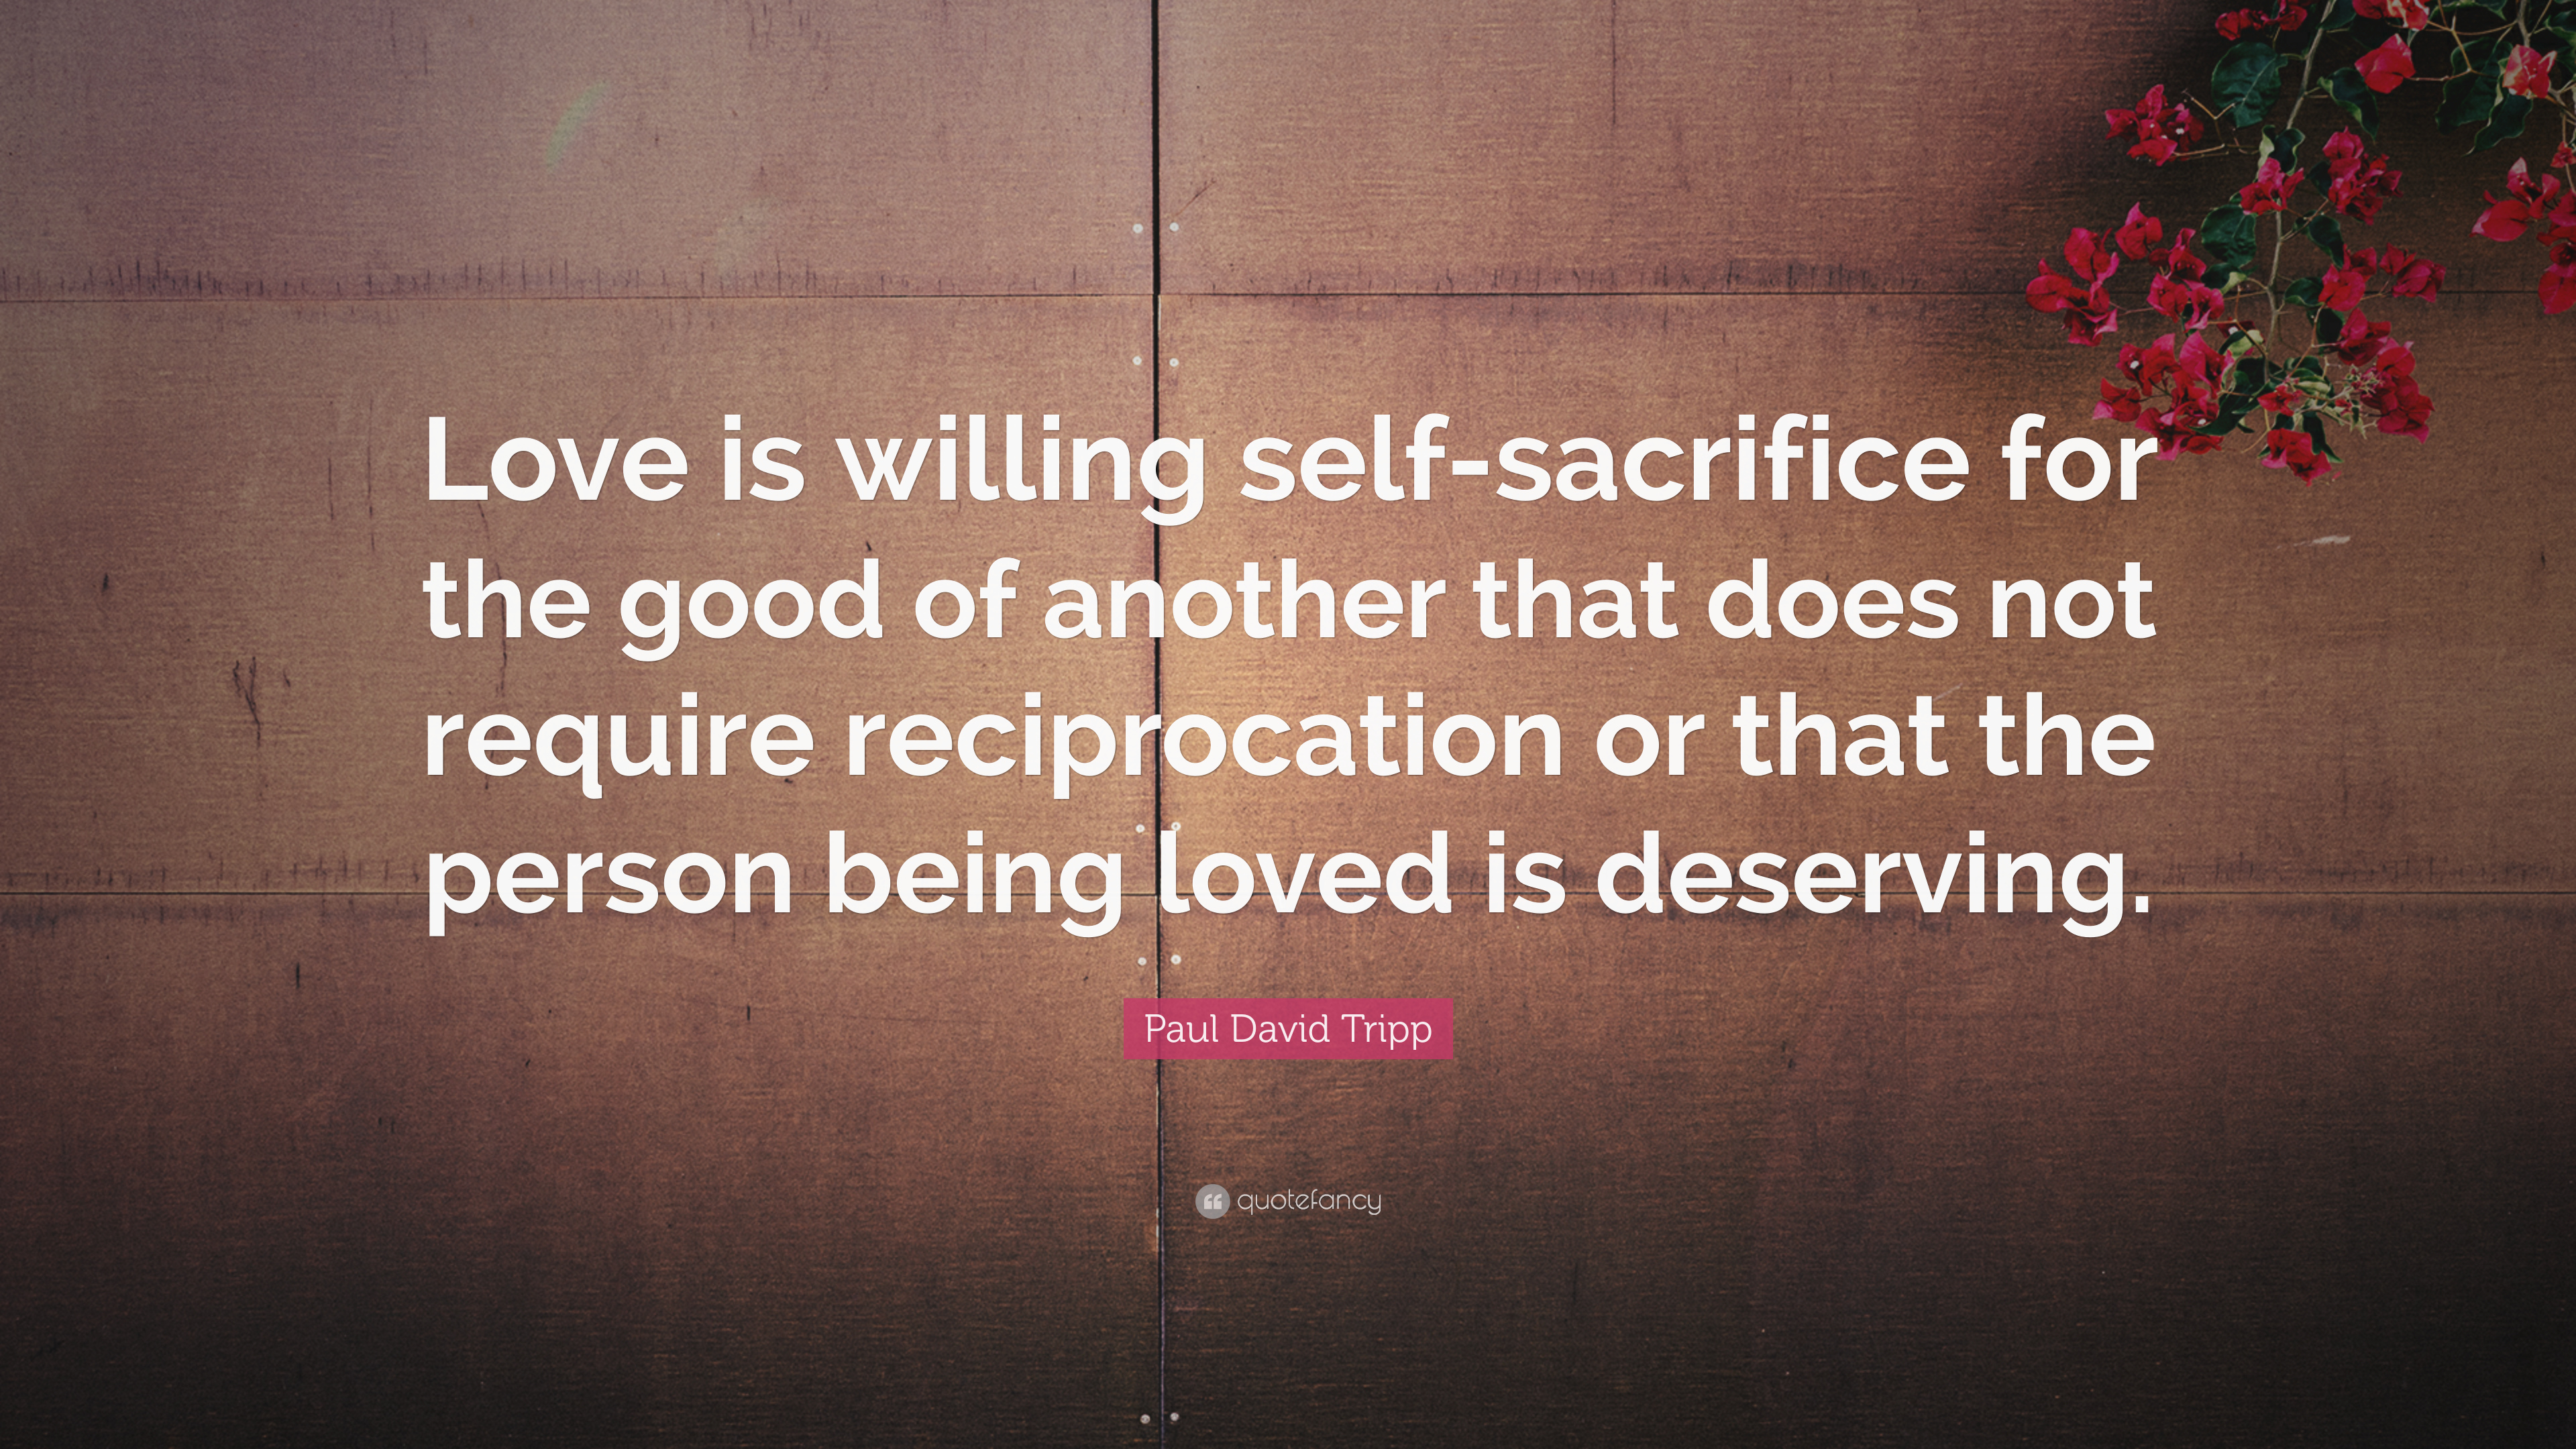 Steve Jobs Motivational Quotes Wallpaper Paul David Tripp Quote Love Is Willing Self Sacrifice